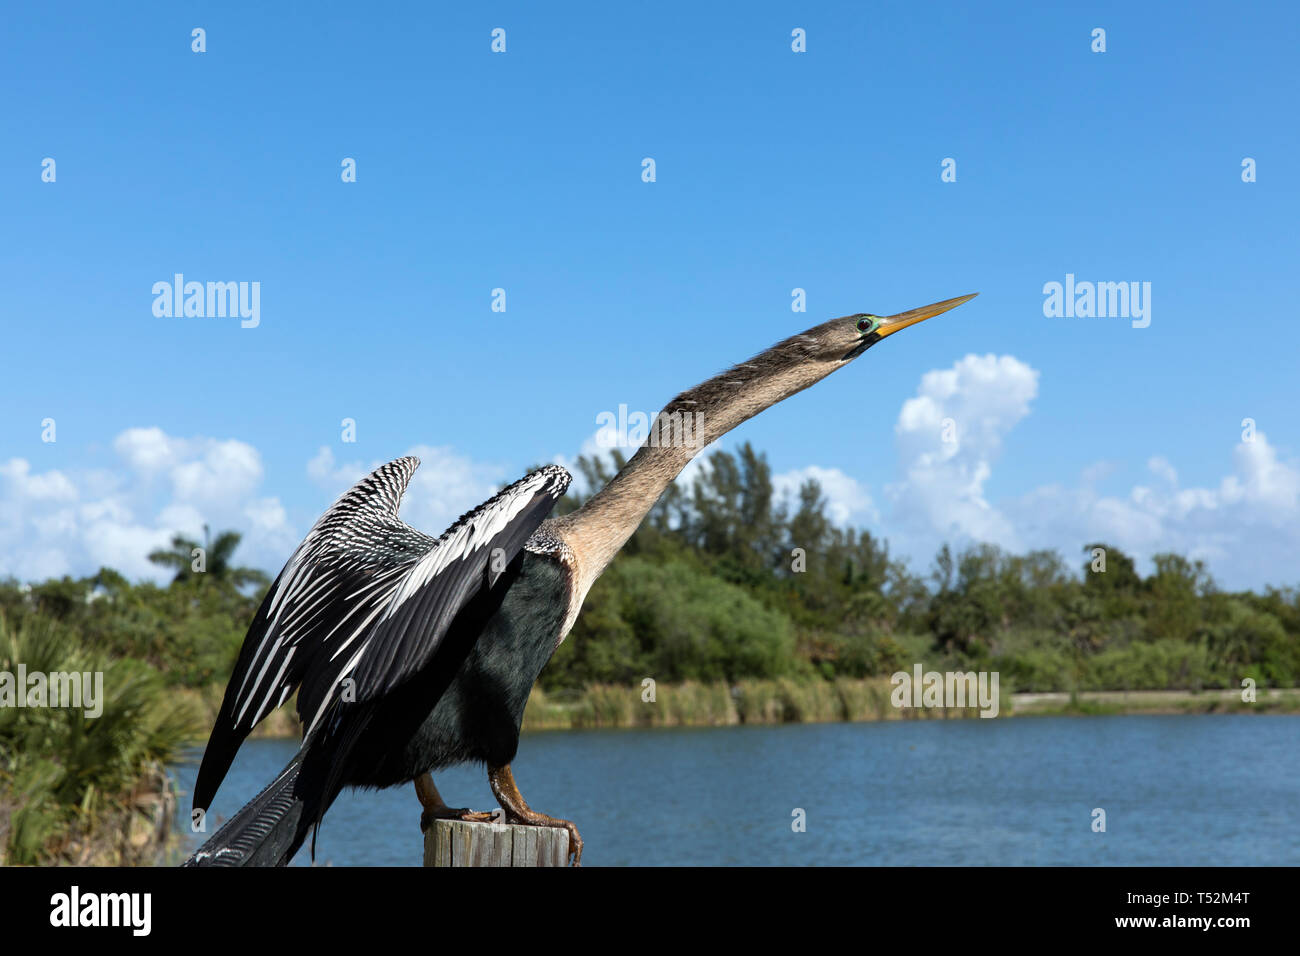 Anhinga bird, drying it's feathers in the sun - Stock Image